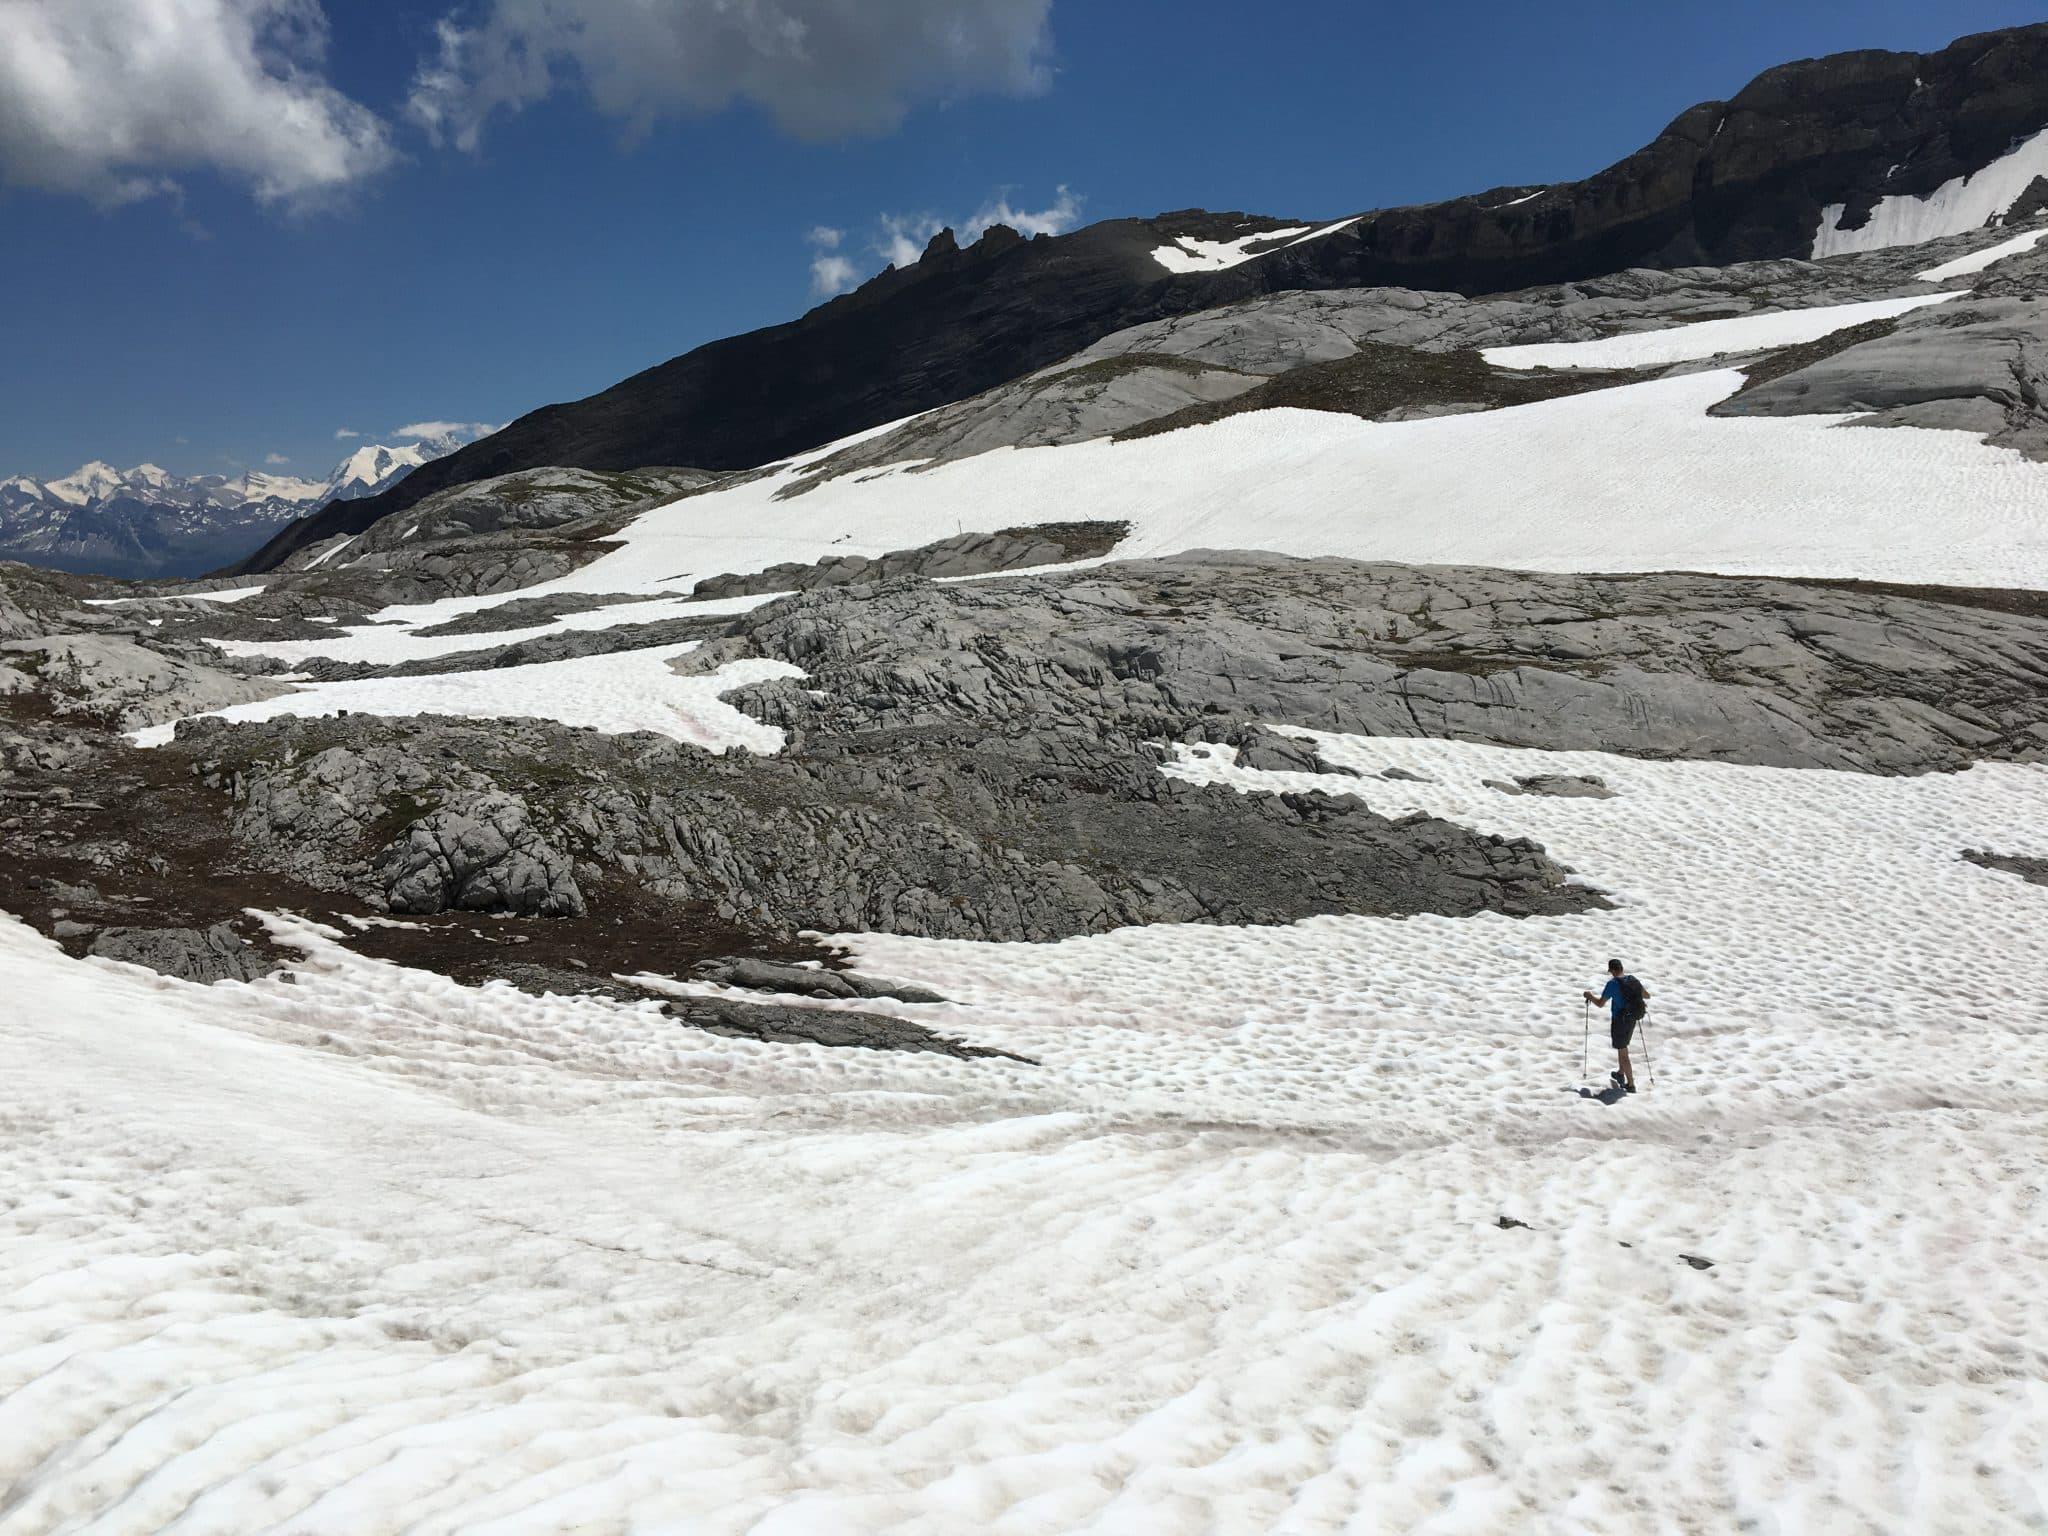 canton-du-valais-neige